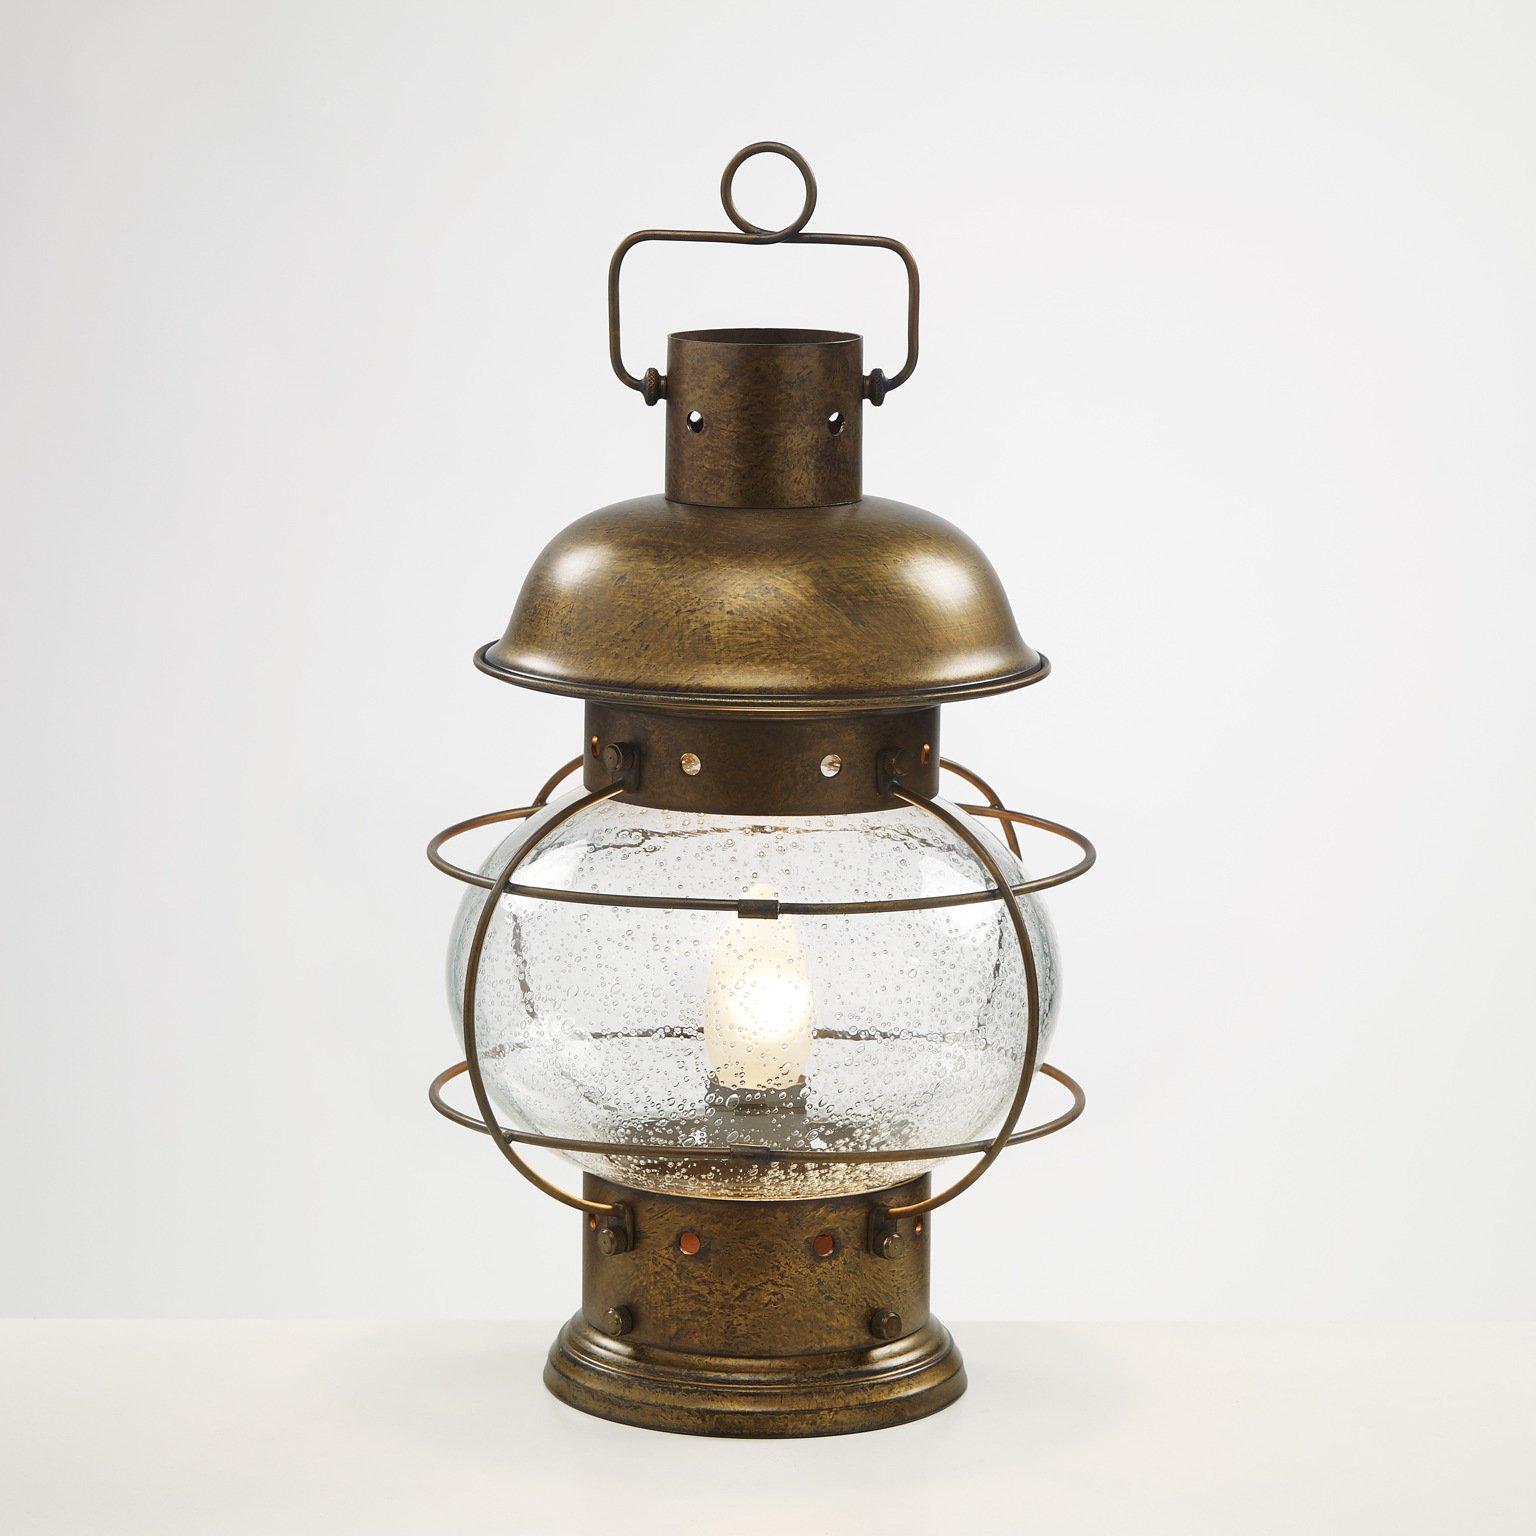 maritime tischlampe in messing und glas. Black Bedroom Furniture Sets. Home Design Ideas